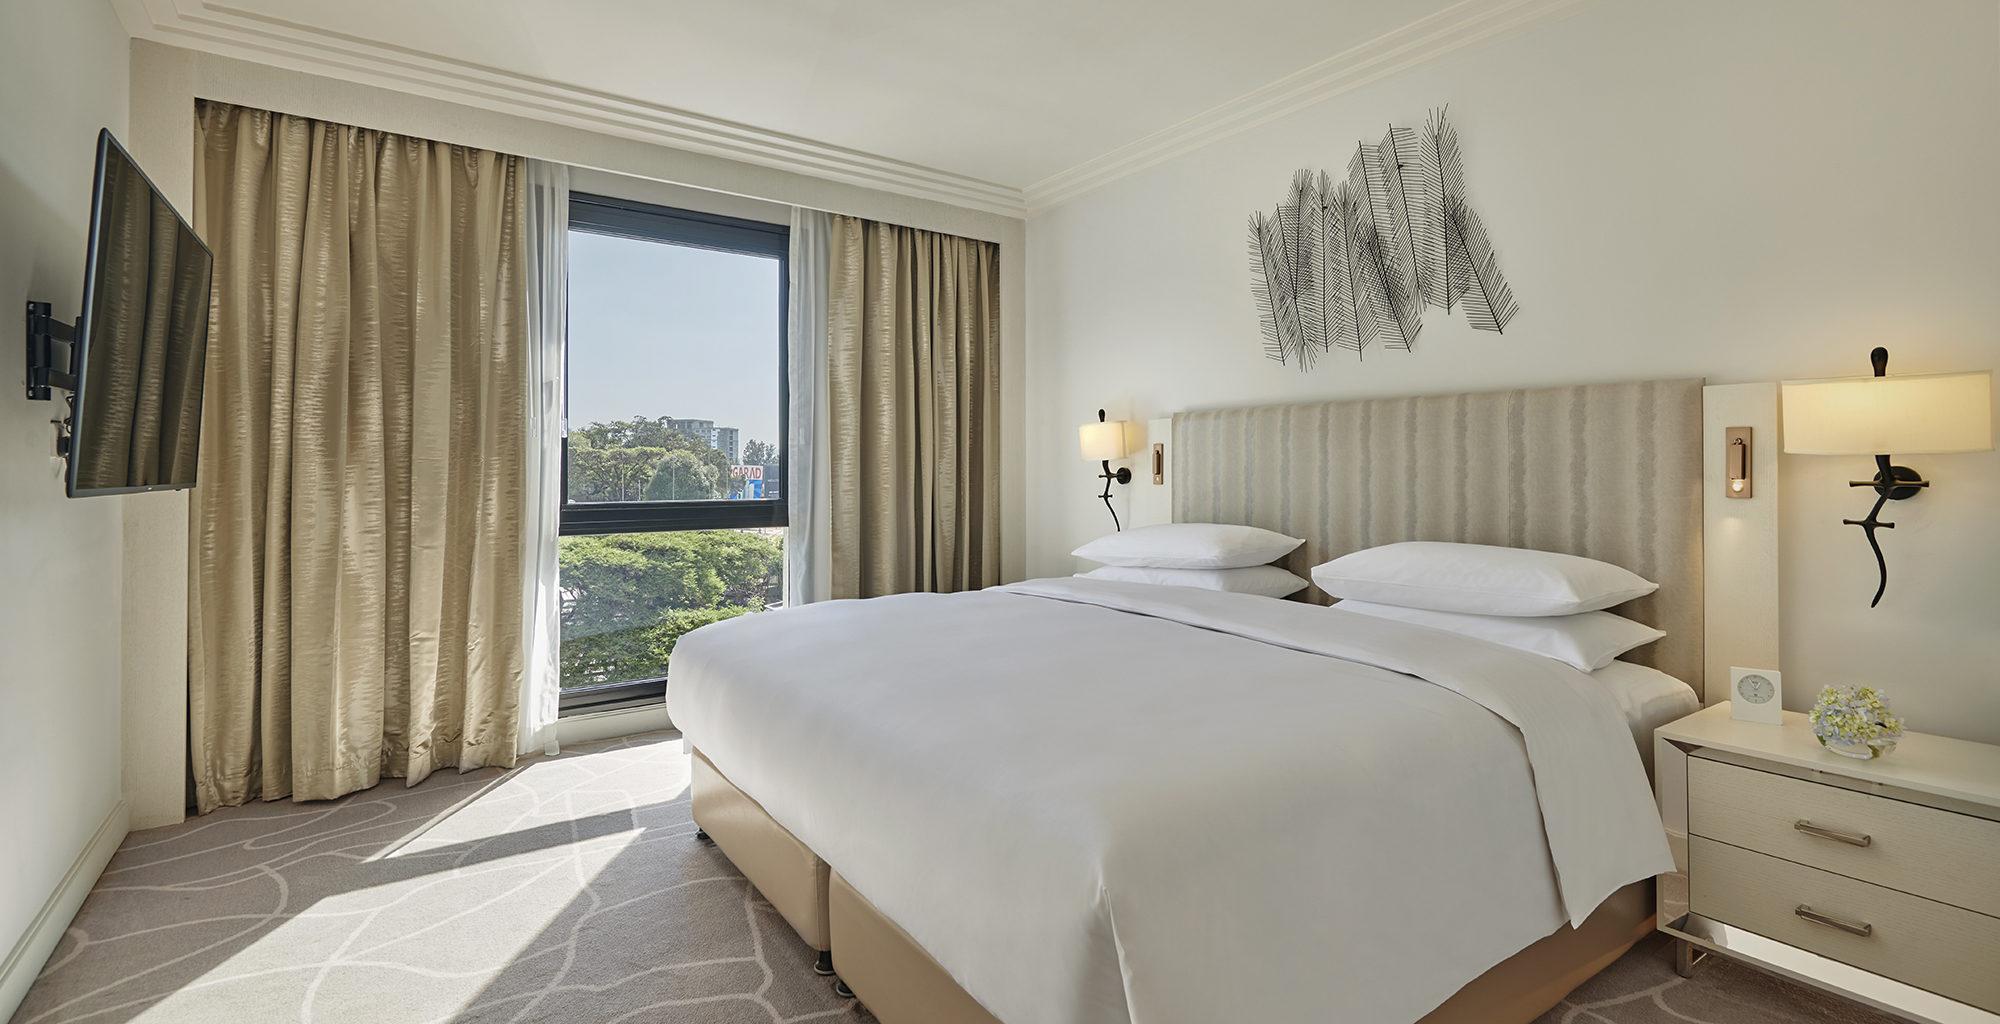 Ethiopia-Hyatt-Regency-Addis-Ababa-Bedroom